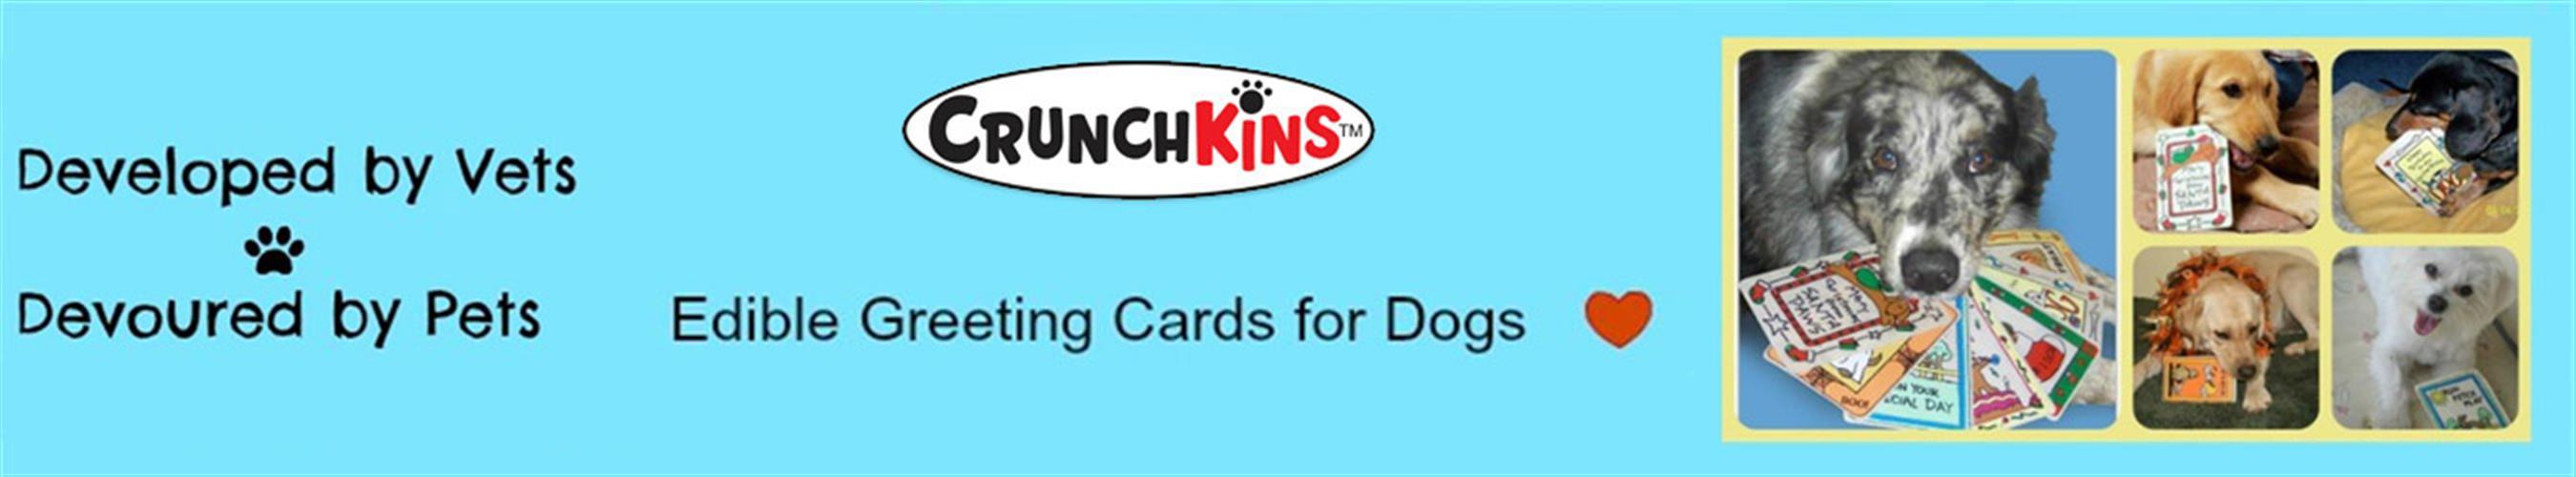 Crunchkins™